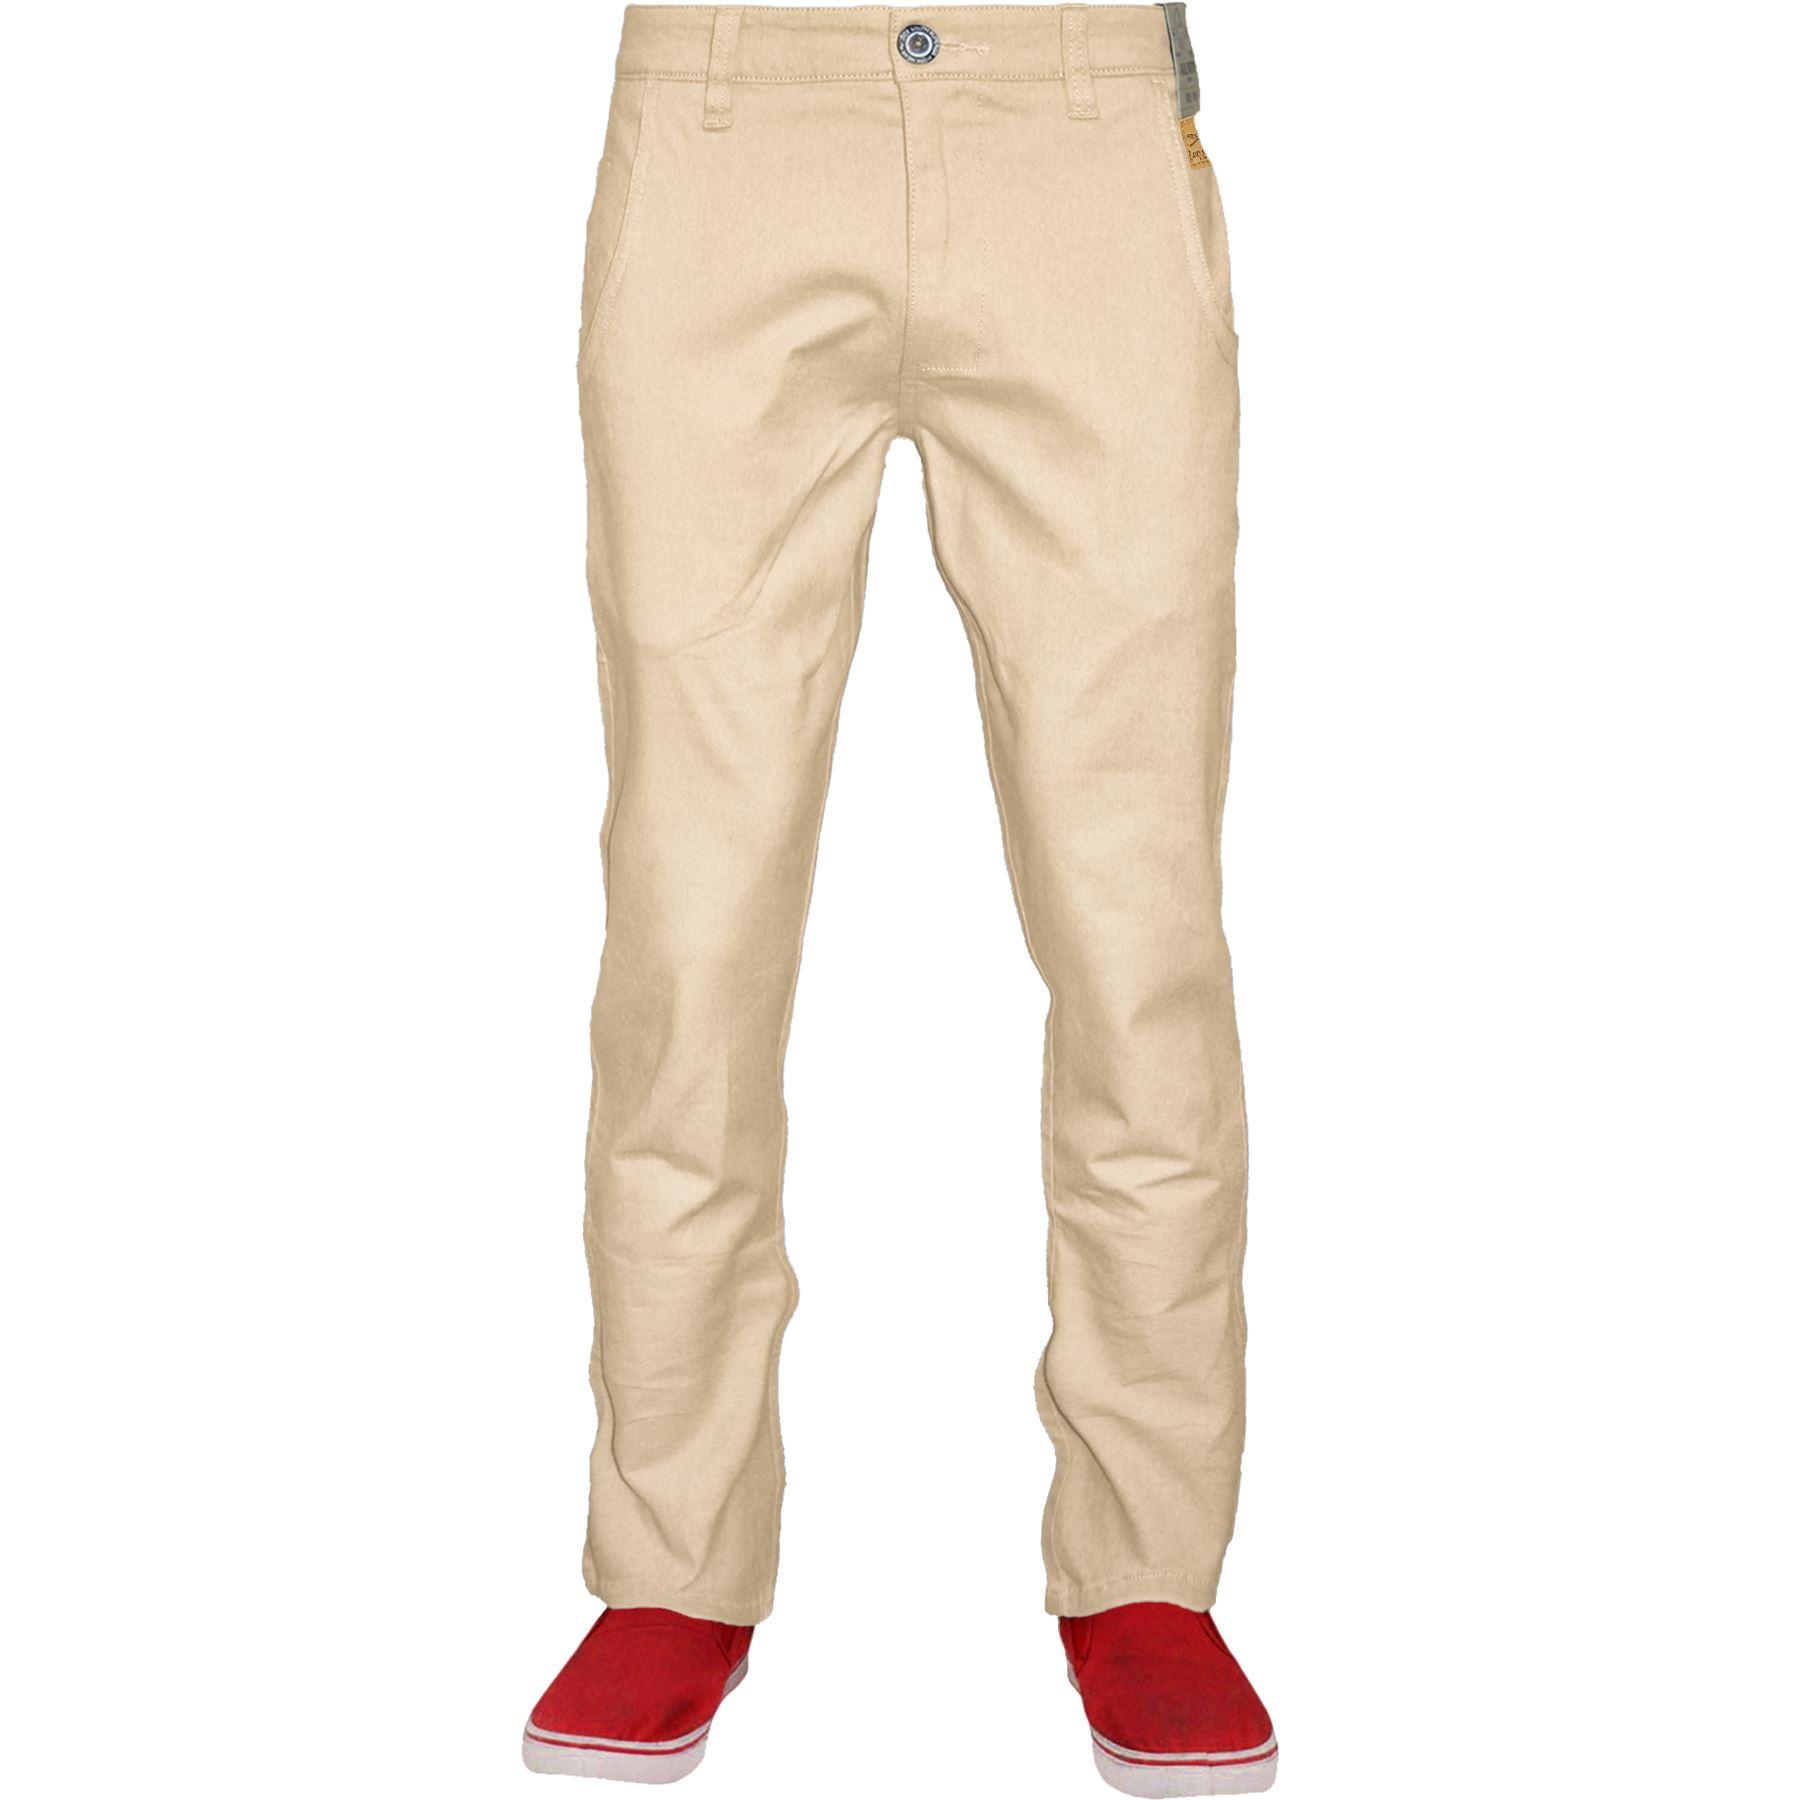 Nouveau Homme Slim Chino Kushiro City Pantalon Causal Homme Coton Jean Pantalon